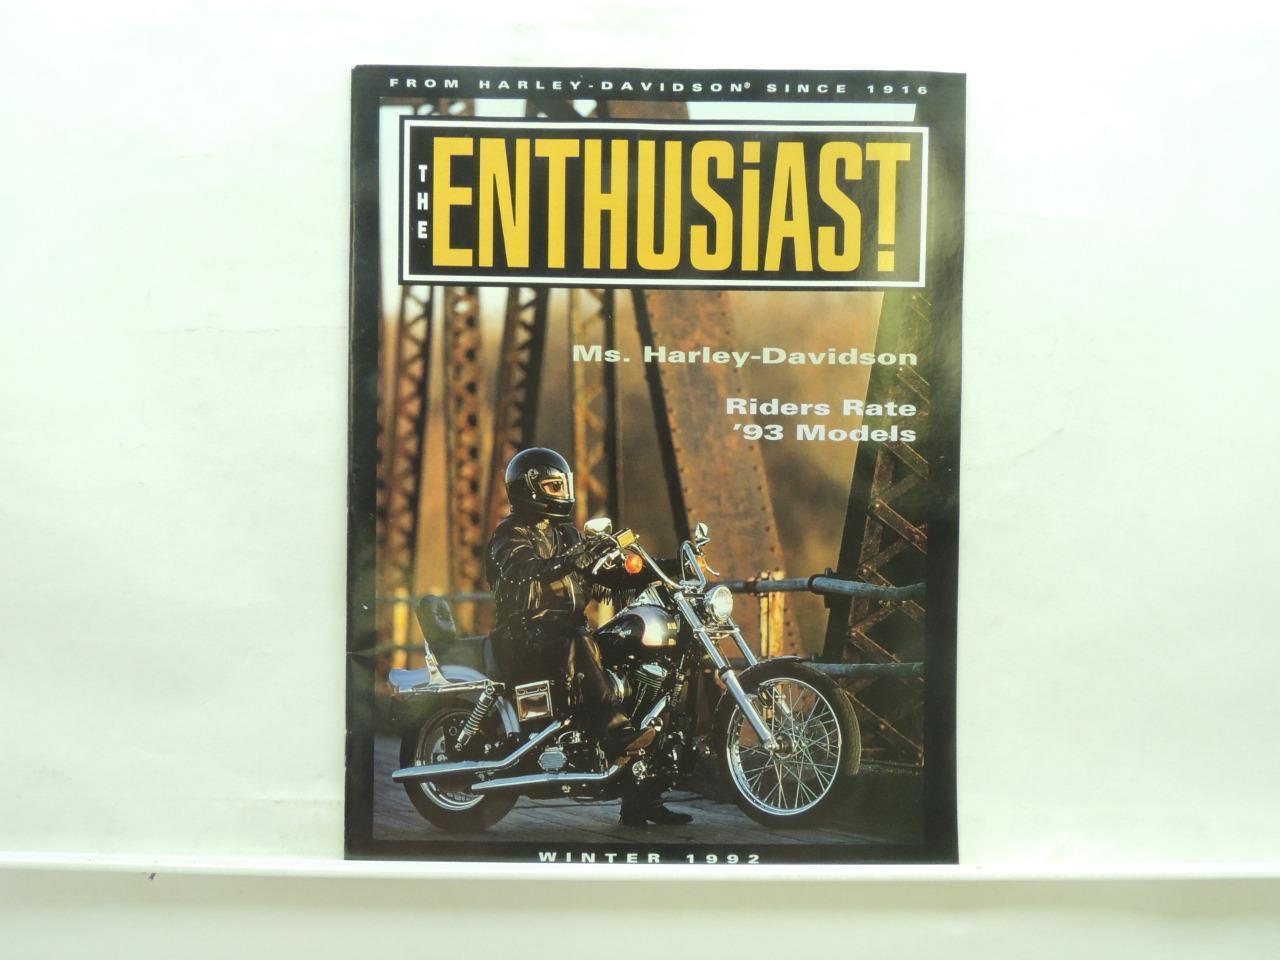 Winter 1992 Enthusiast Magazine Harley-Davidson Softail Low Rider 1200 L5925